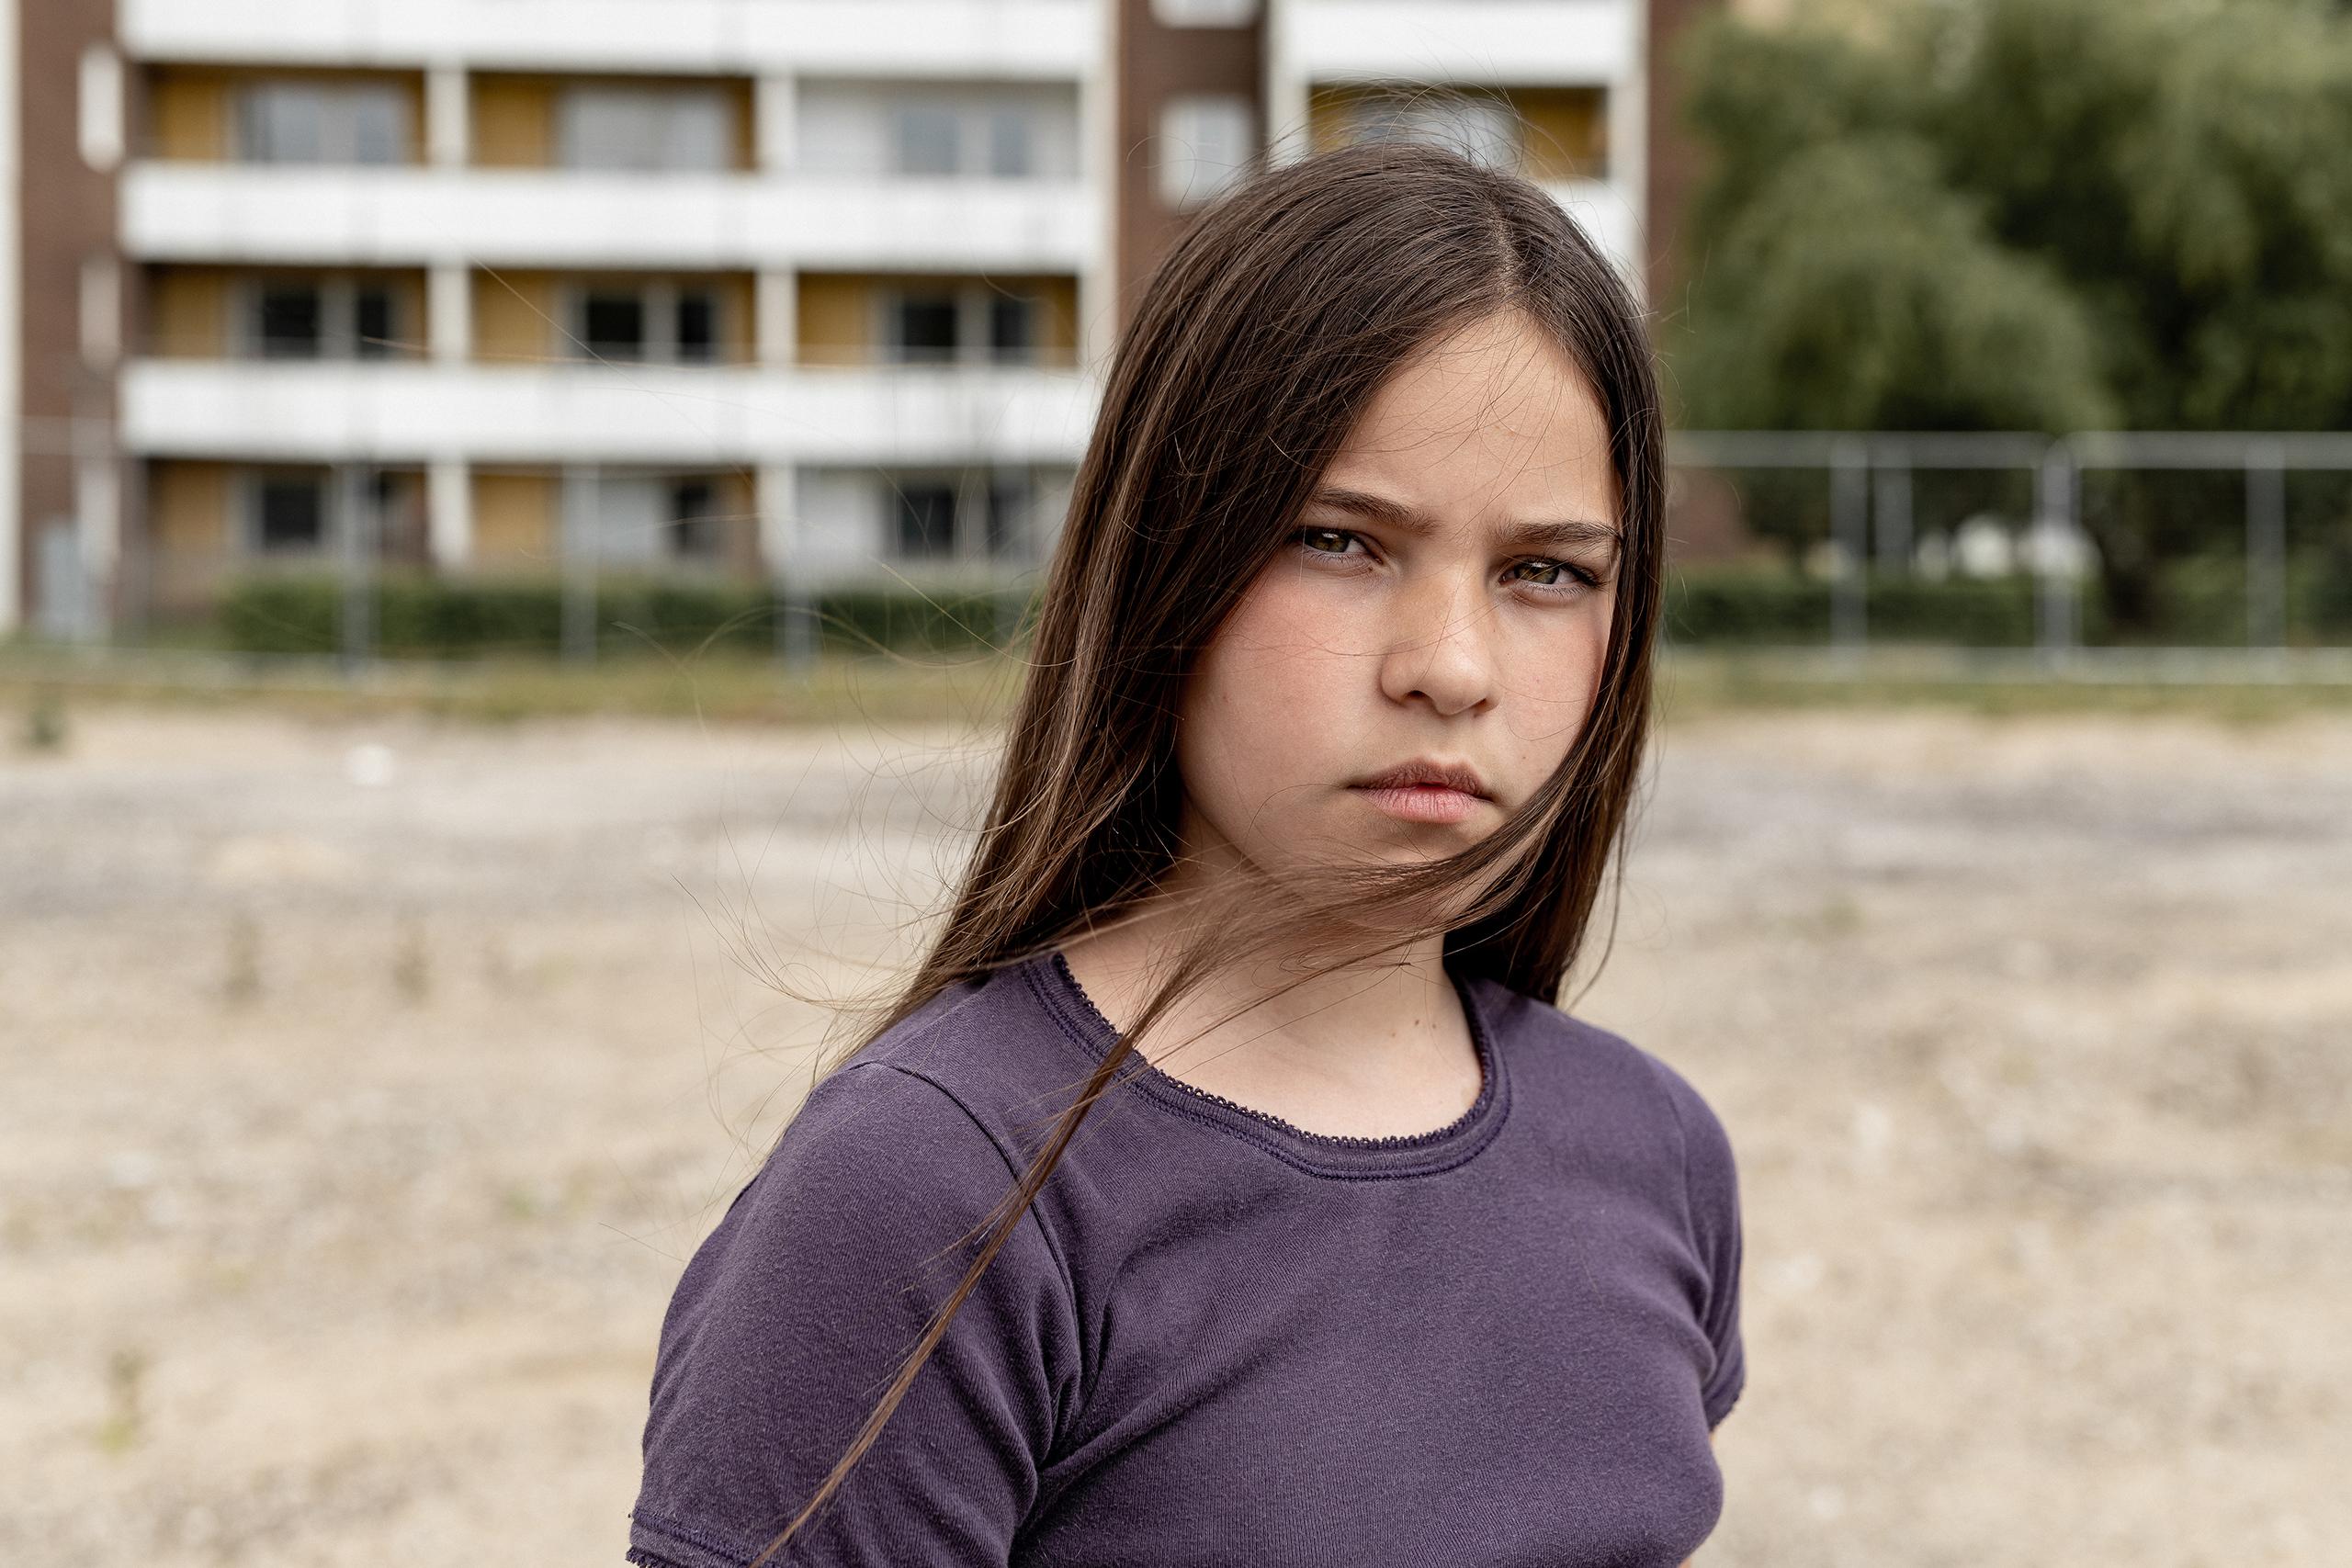 Skåne Stadsmission, Portrait, Girl, Summer, School, City, Life